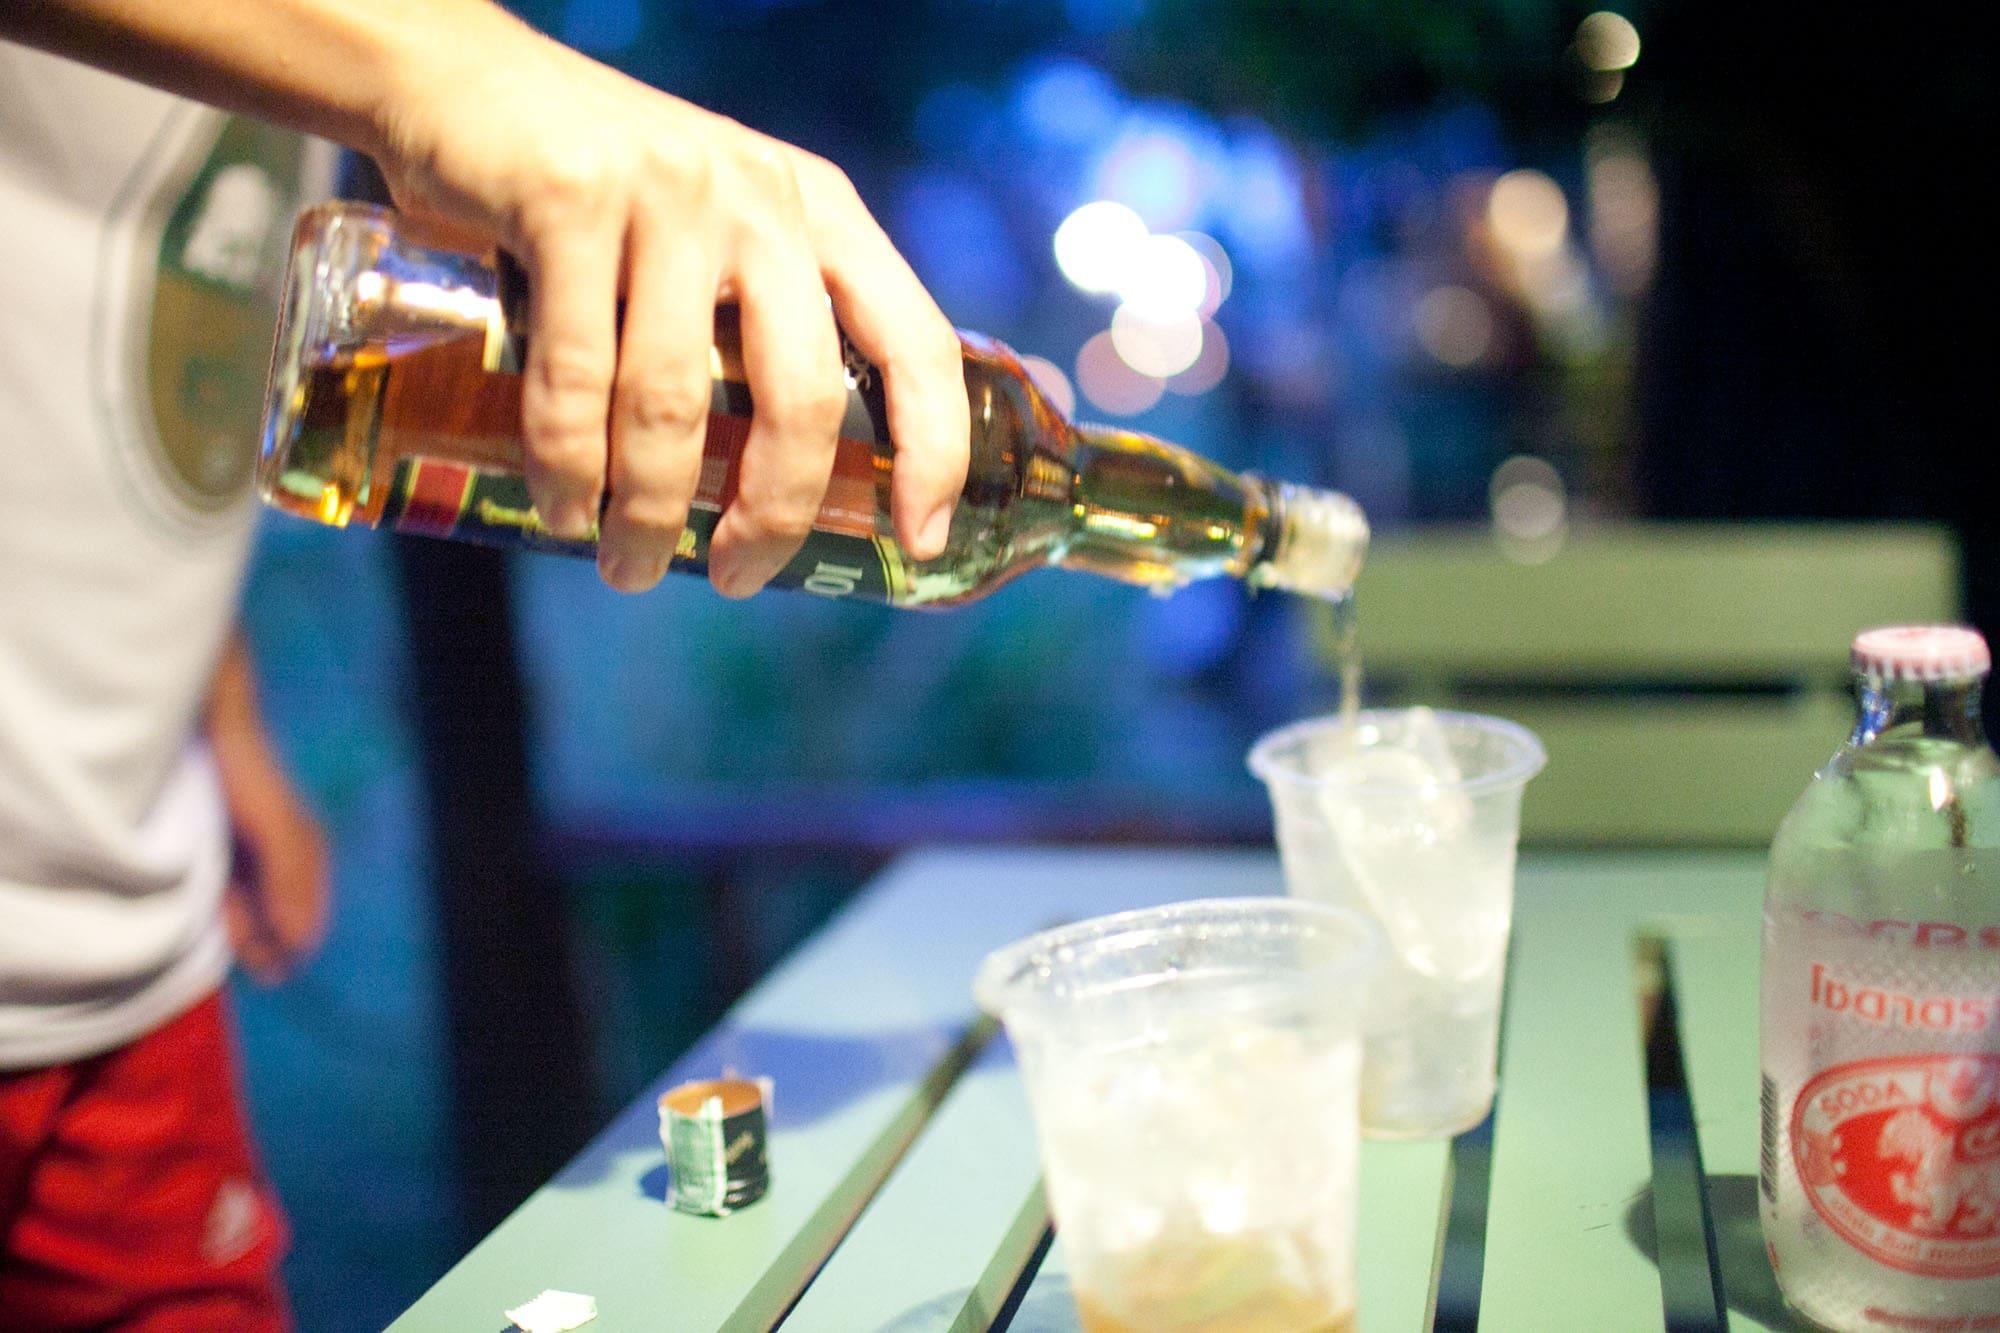 Pouring drinks in Koh Lanta, Thailand